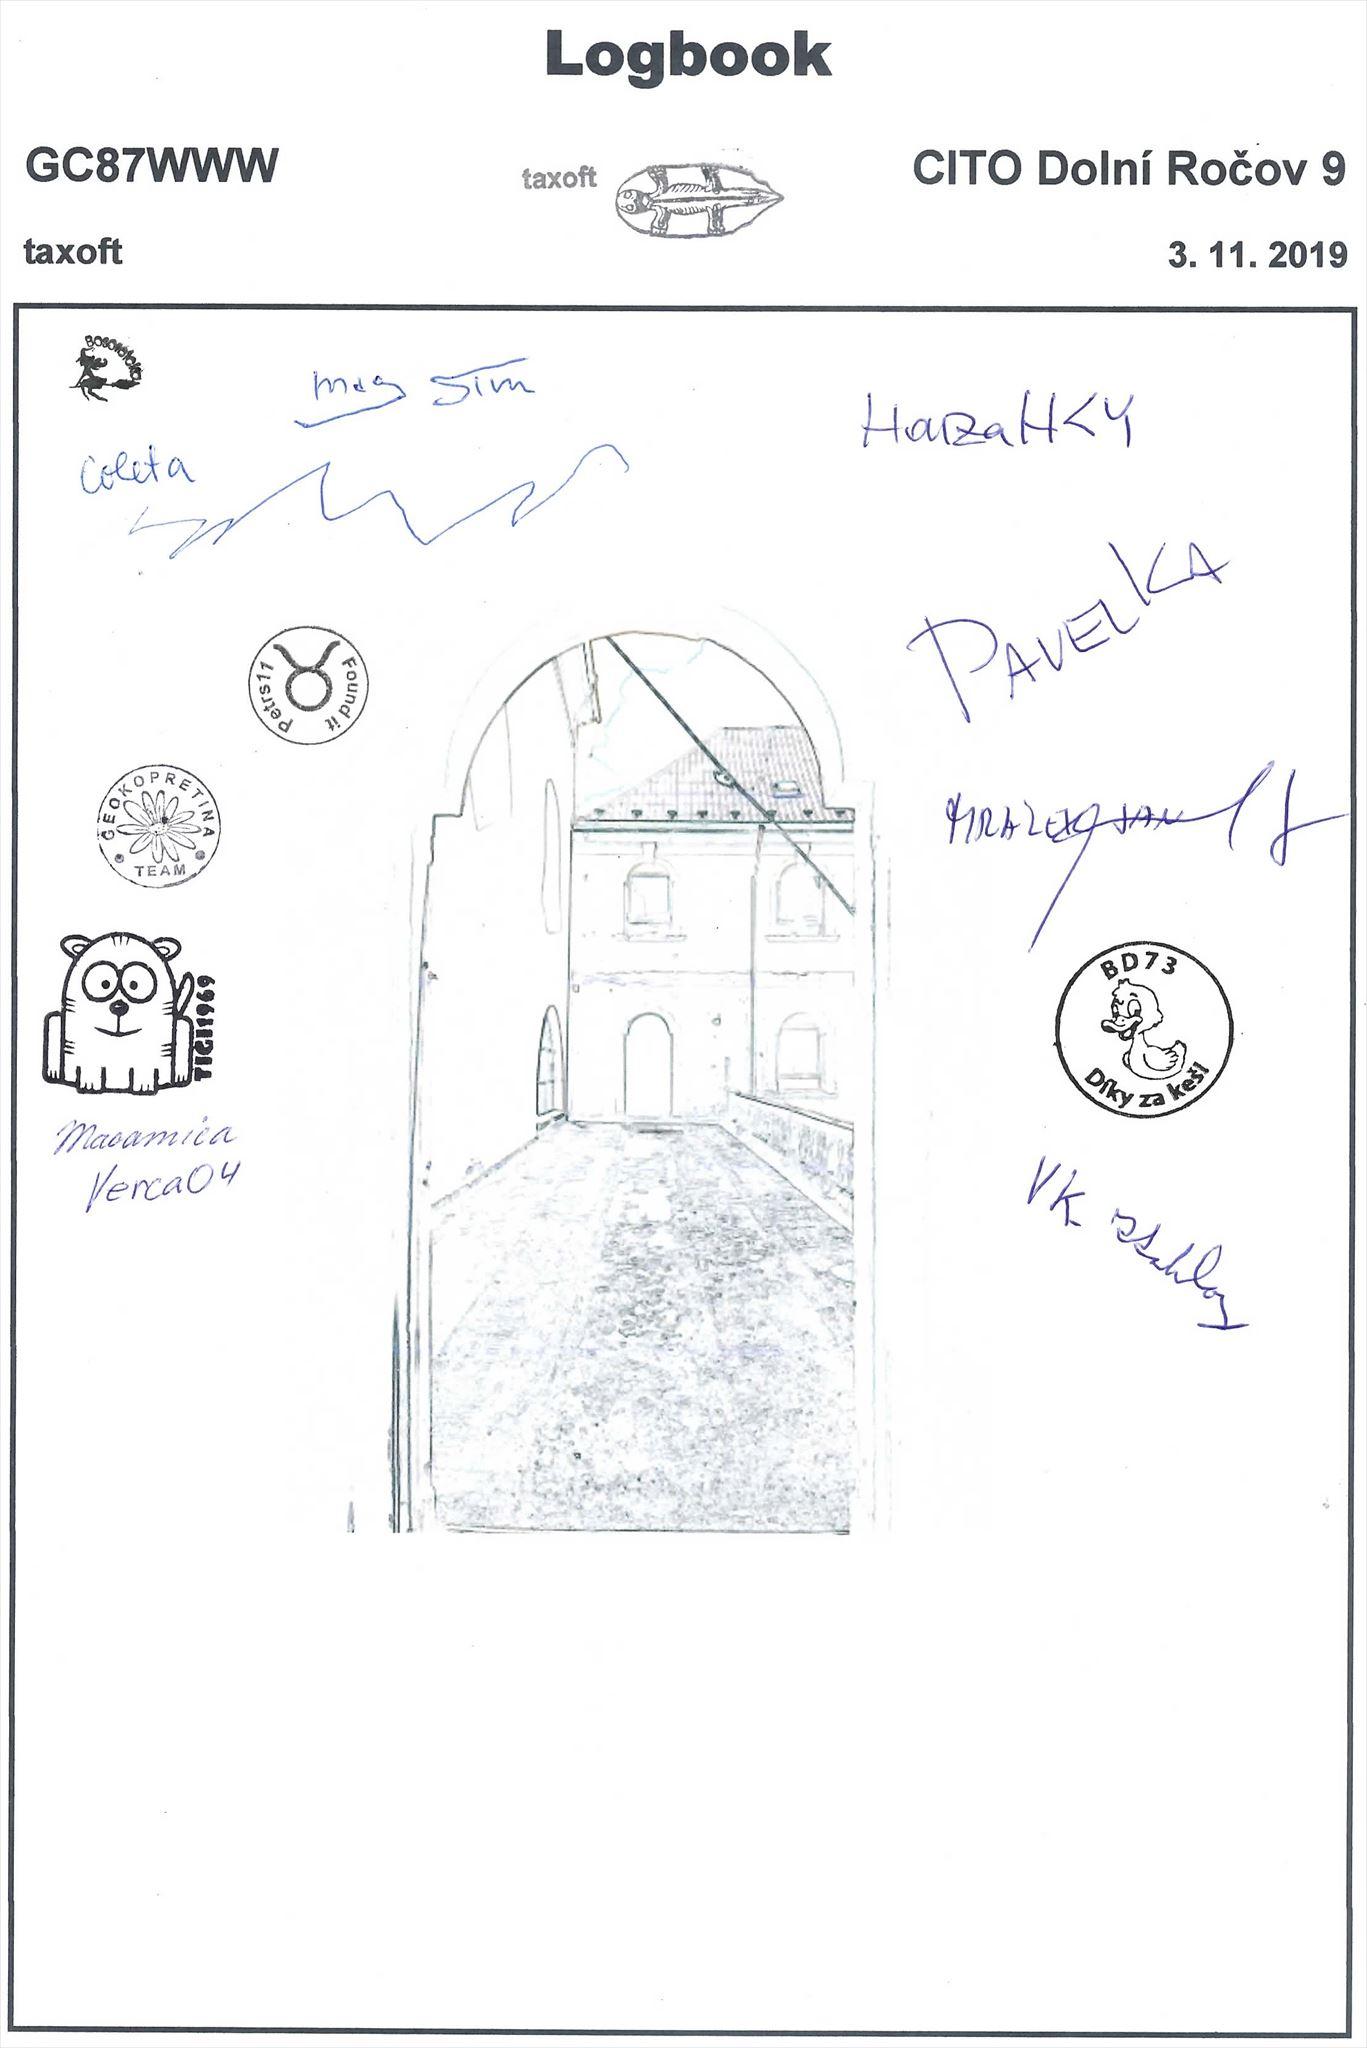 GC87WWW - CITO Dolní Ročov 9 - logbook